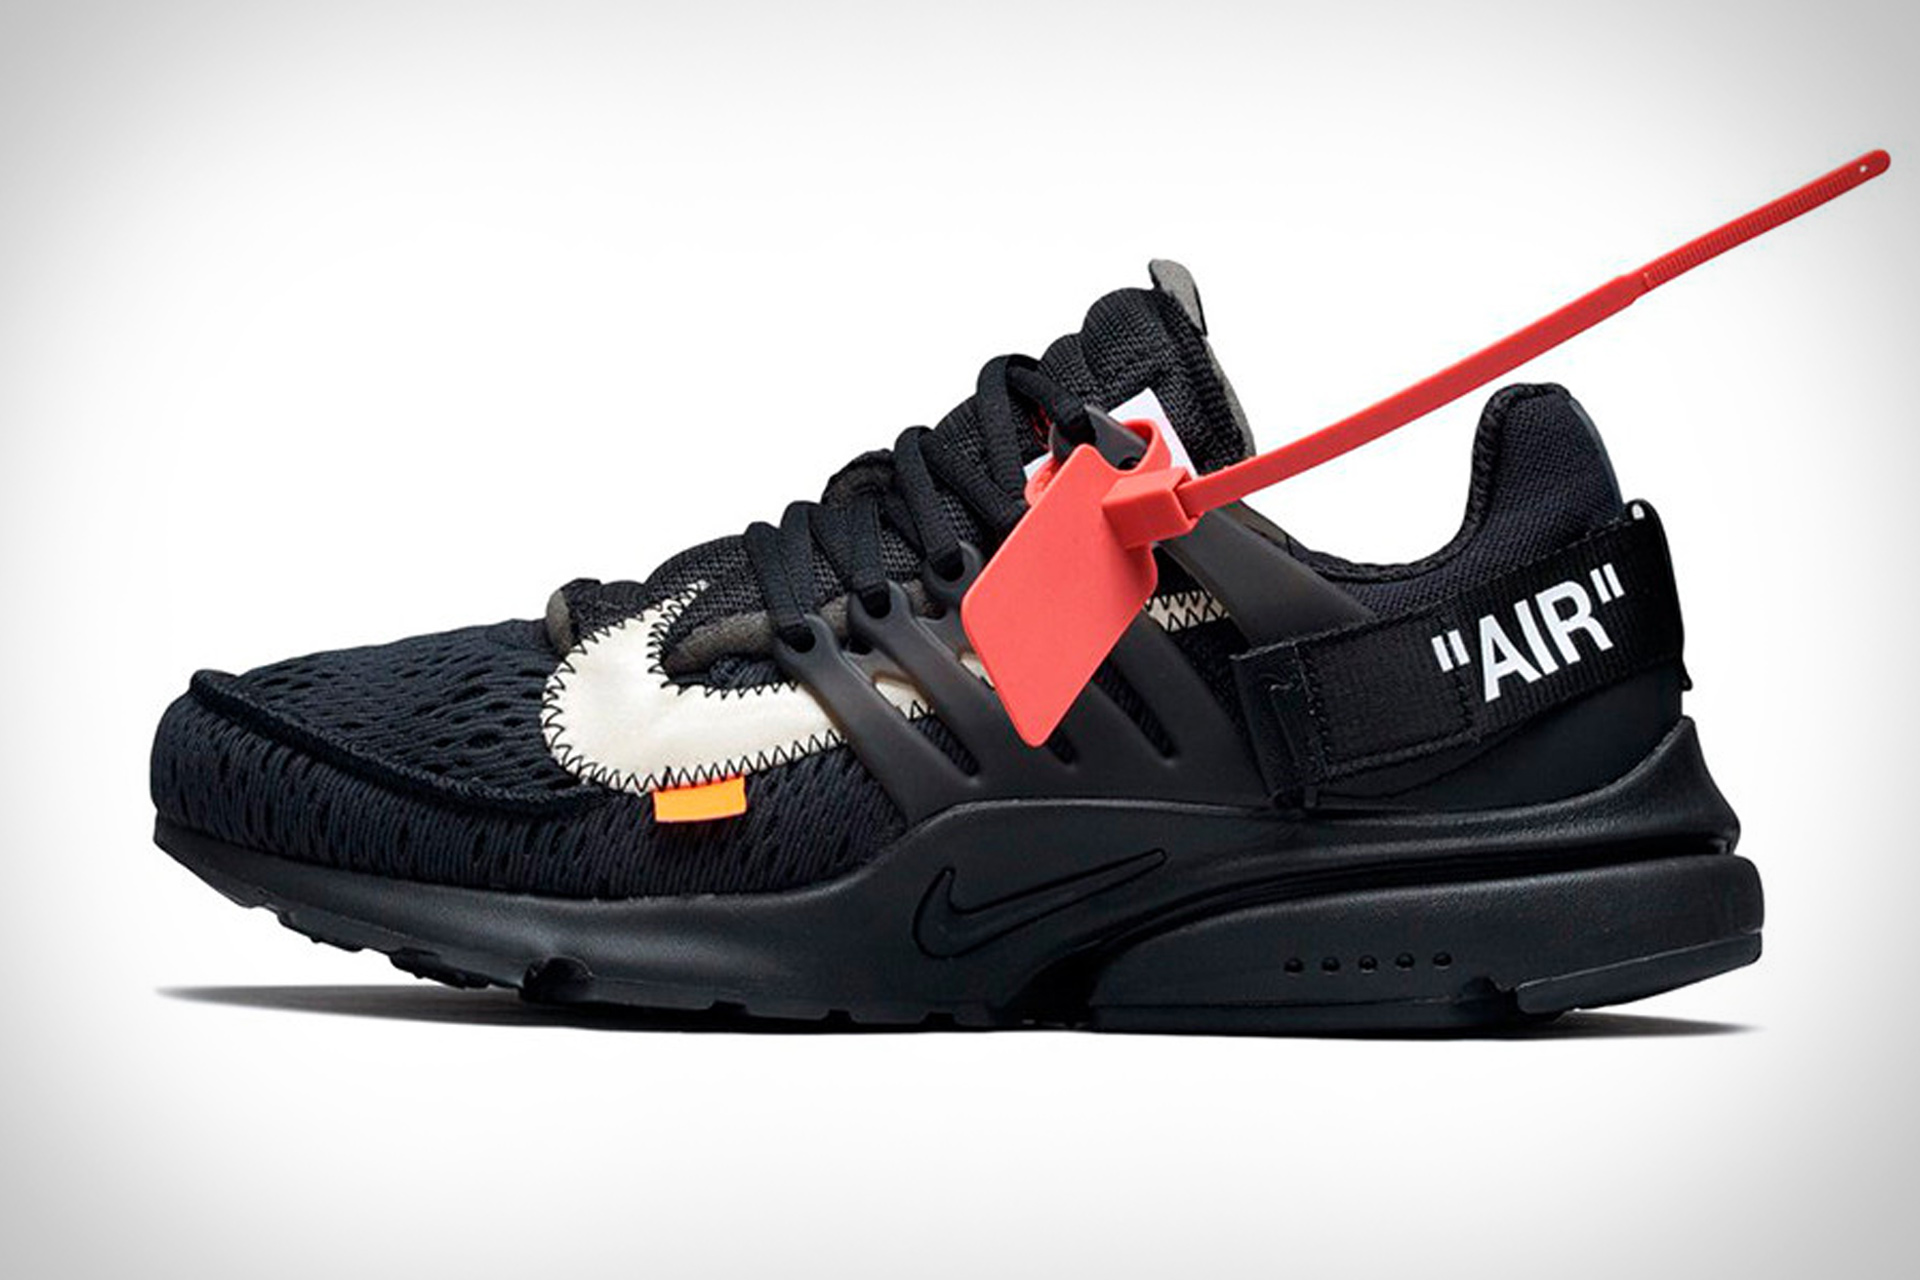 f1ac0c5225c Nike x Off-White Air Presto Sneaker